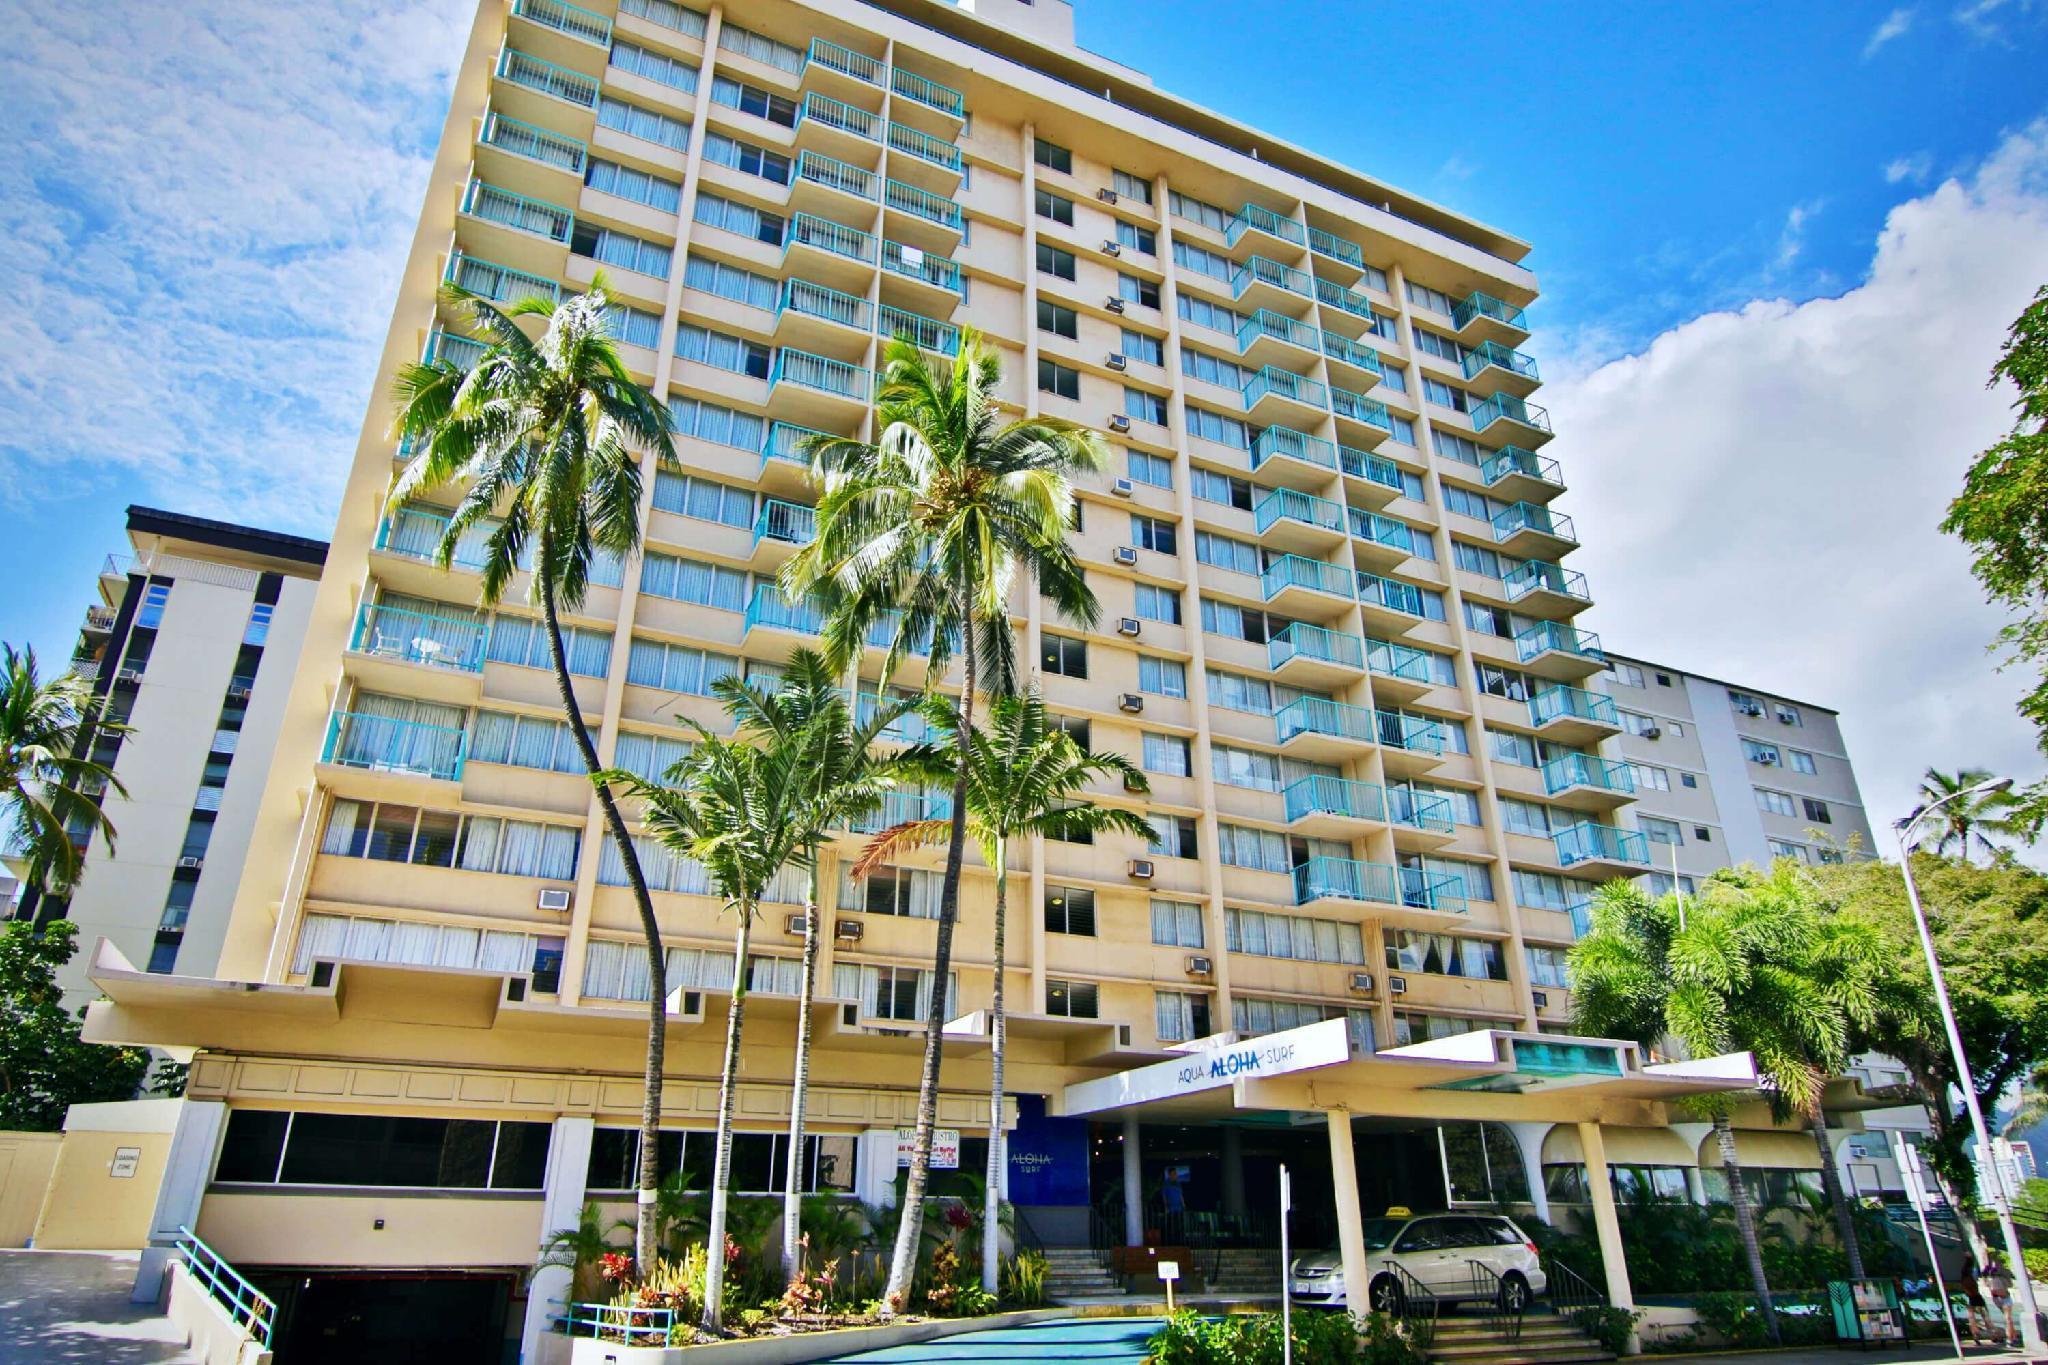 Aqua Aloha Surf Waikiki Hotel